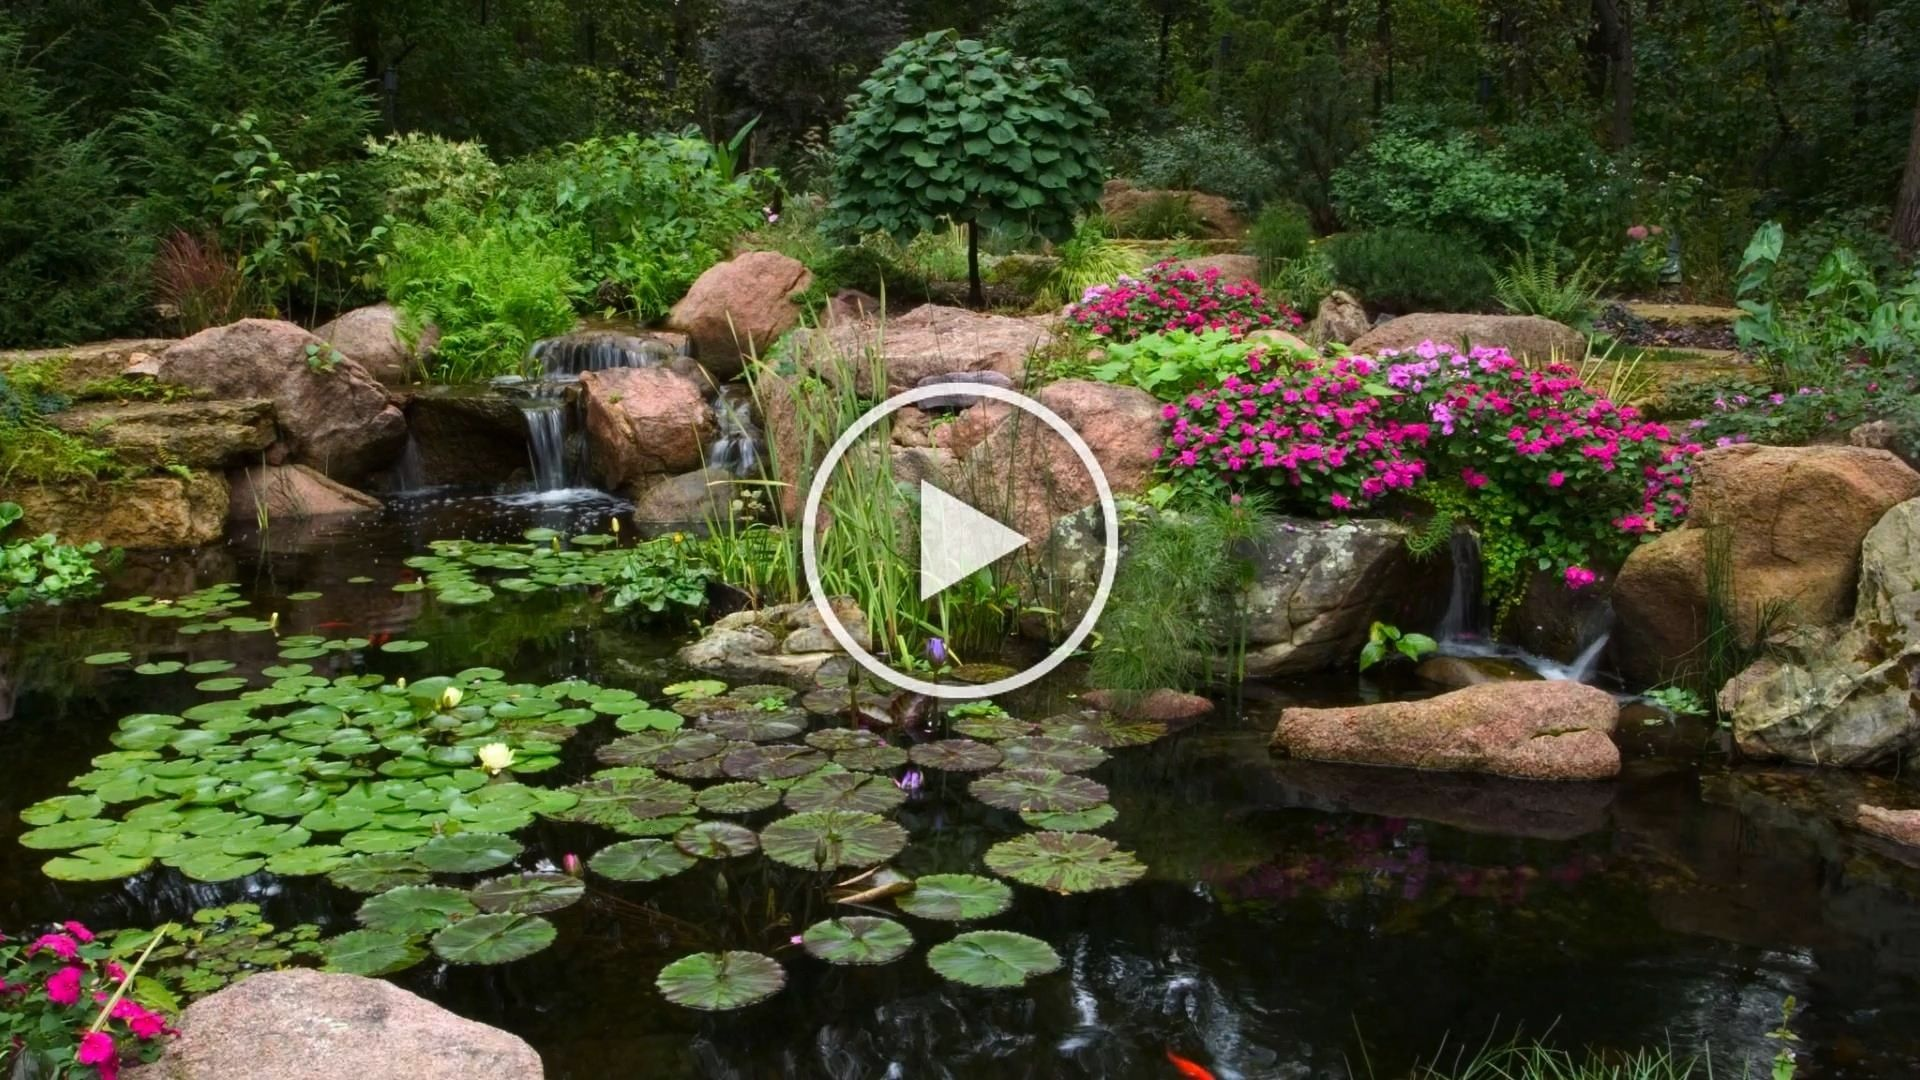 Landscapedesign Backyardideas Watergarden Blissful Koipond Garden Enjoy Water Video This Pondenjoy This Blissful Water Garden Video Ponds Backyard Aquatic Plants Water Garden